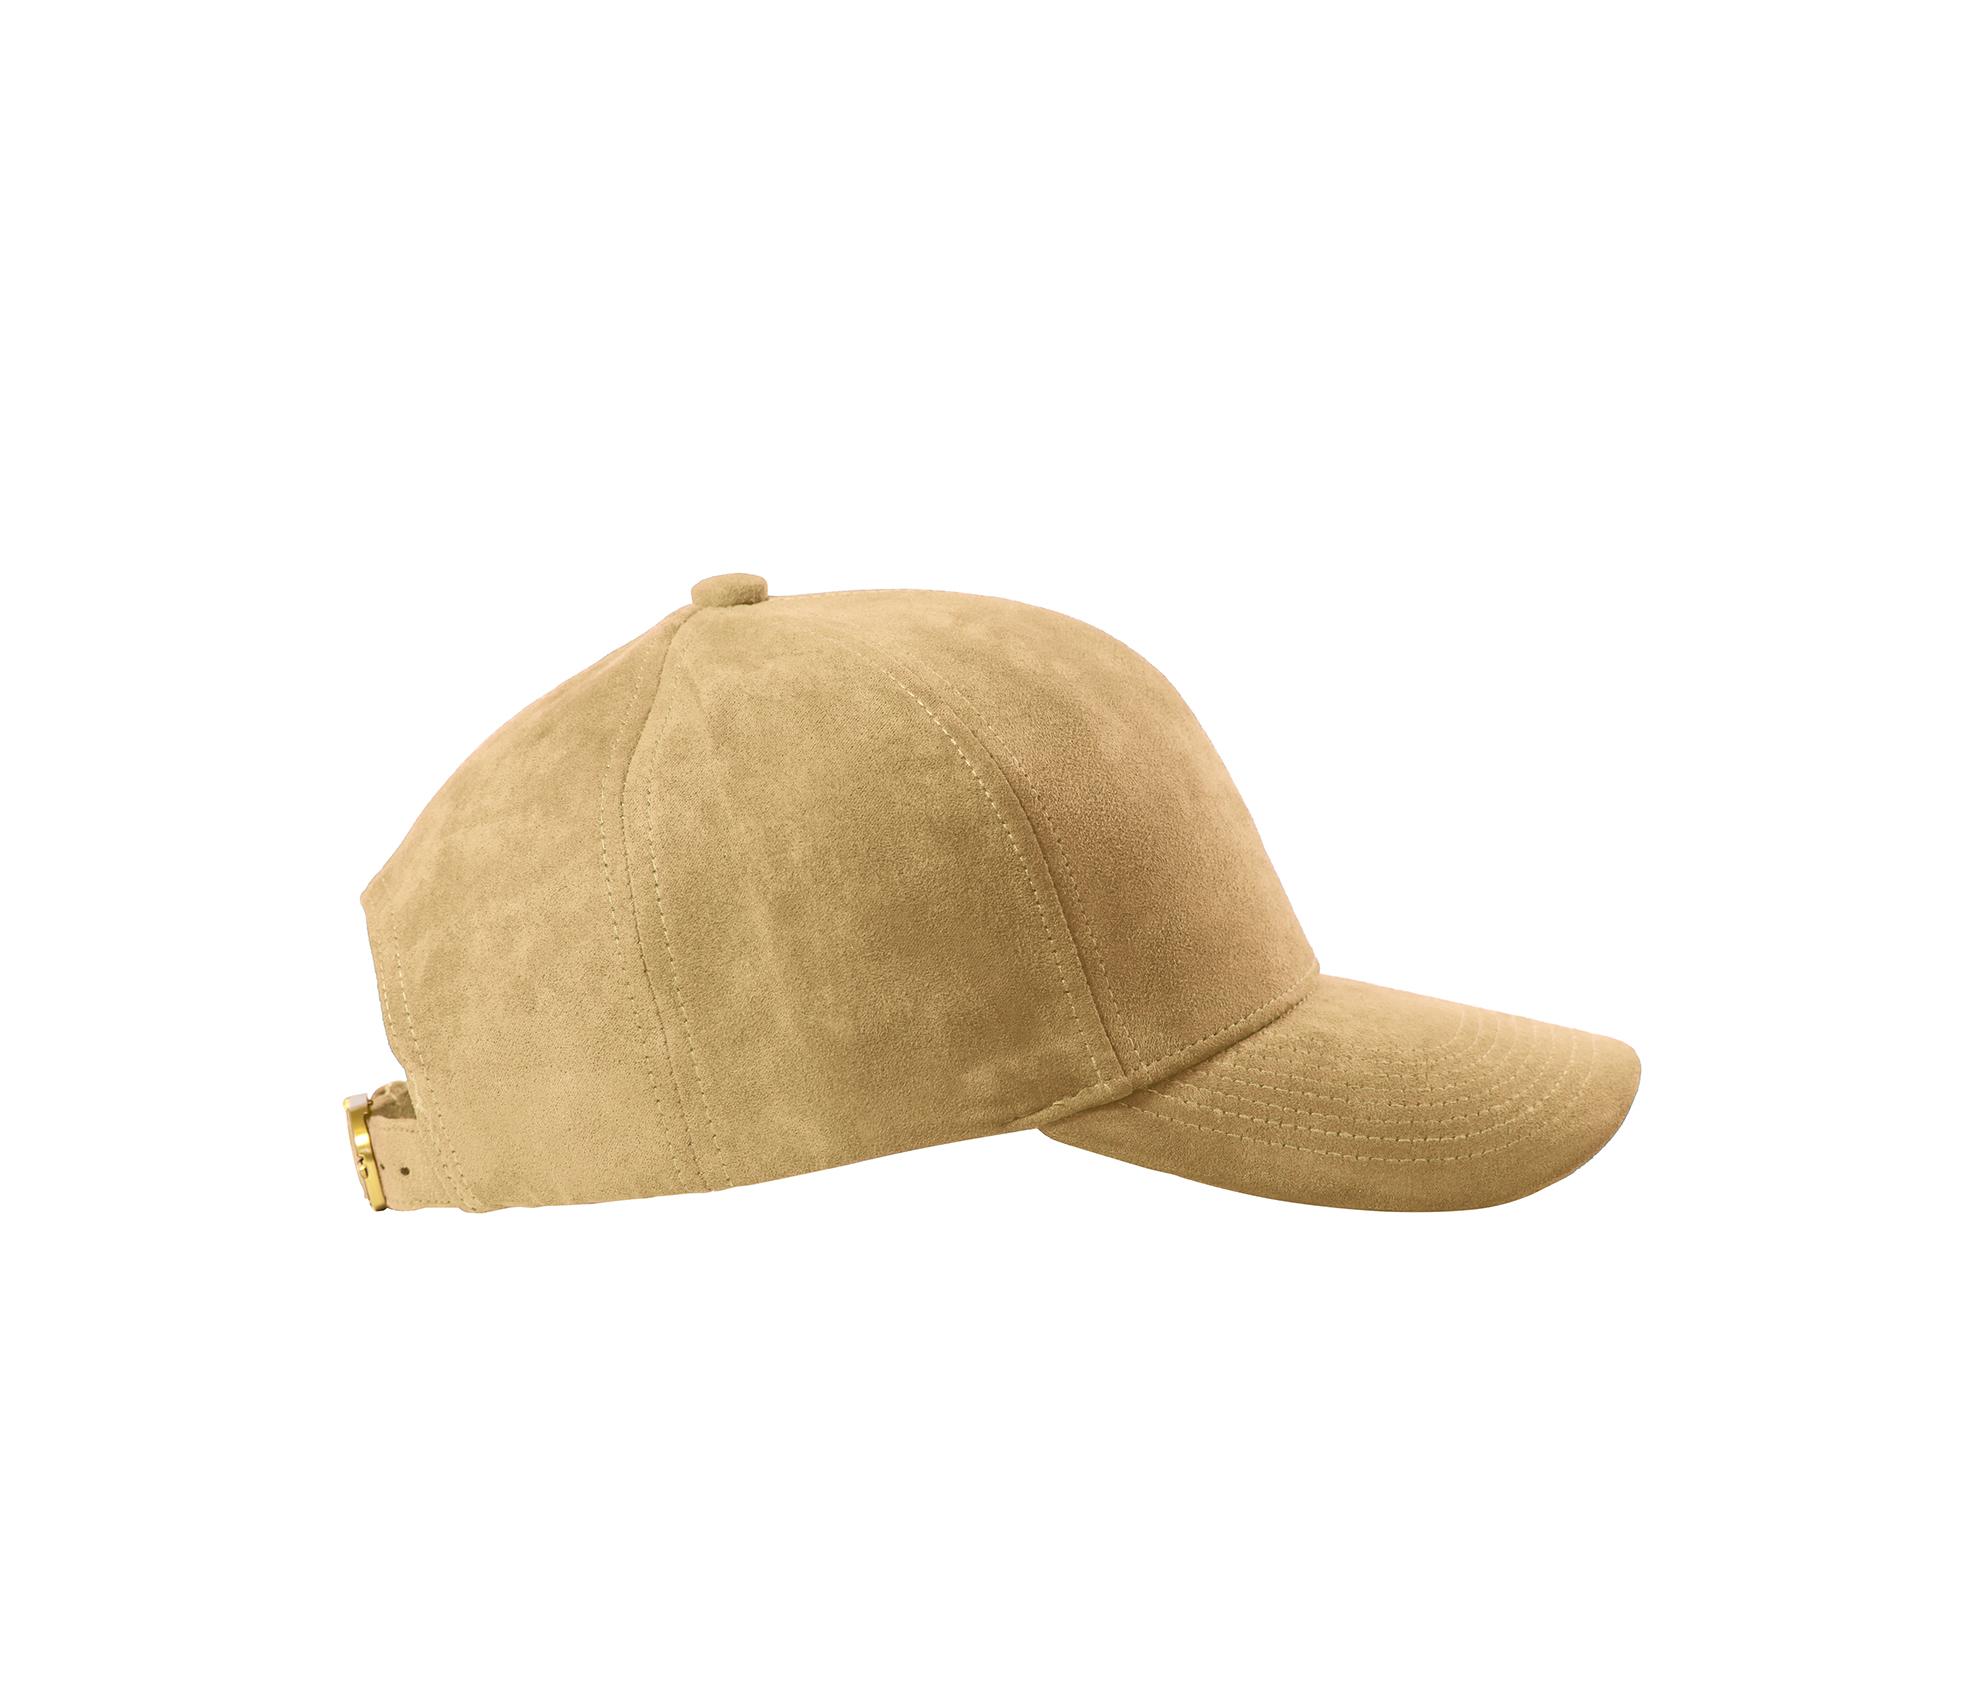 baseball-cap-beige-suede-gold-side